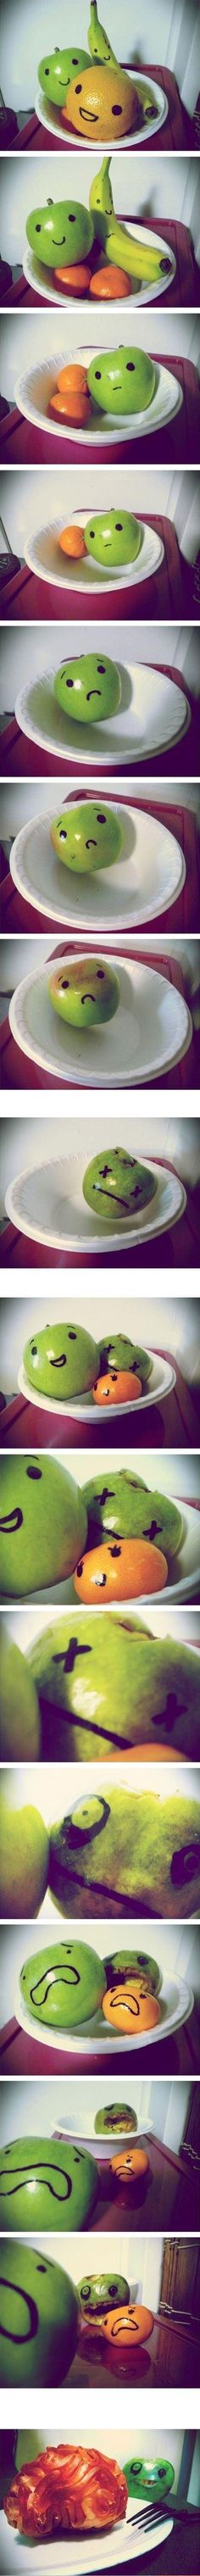 Fruit Zombies